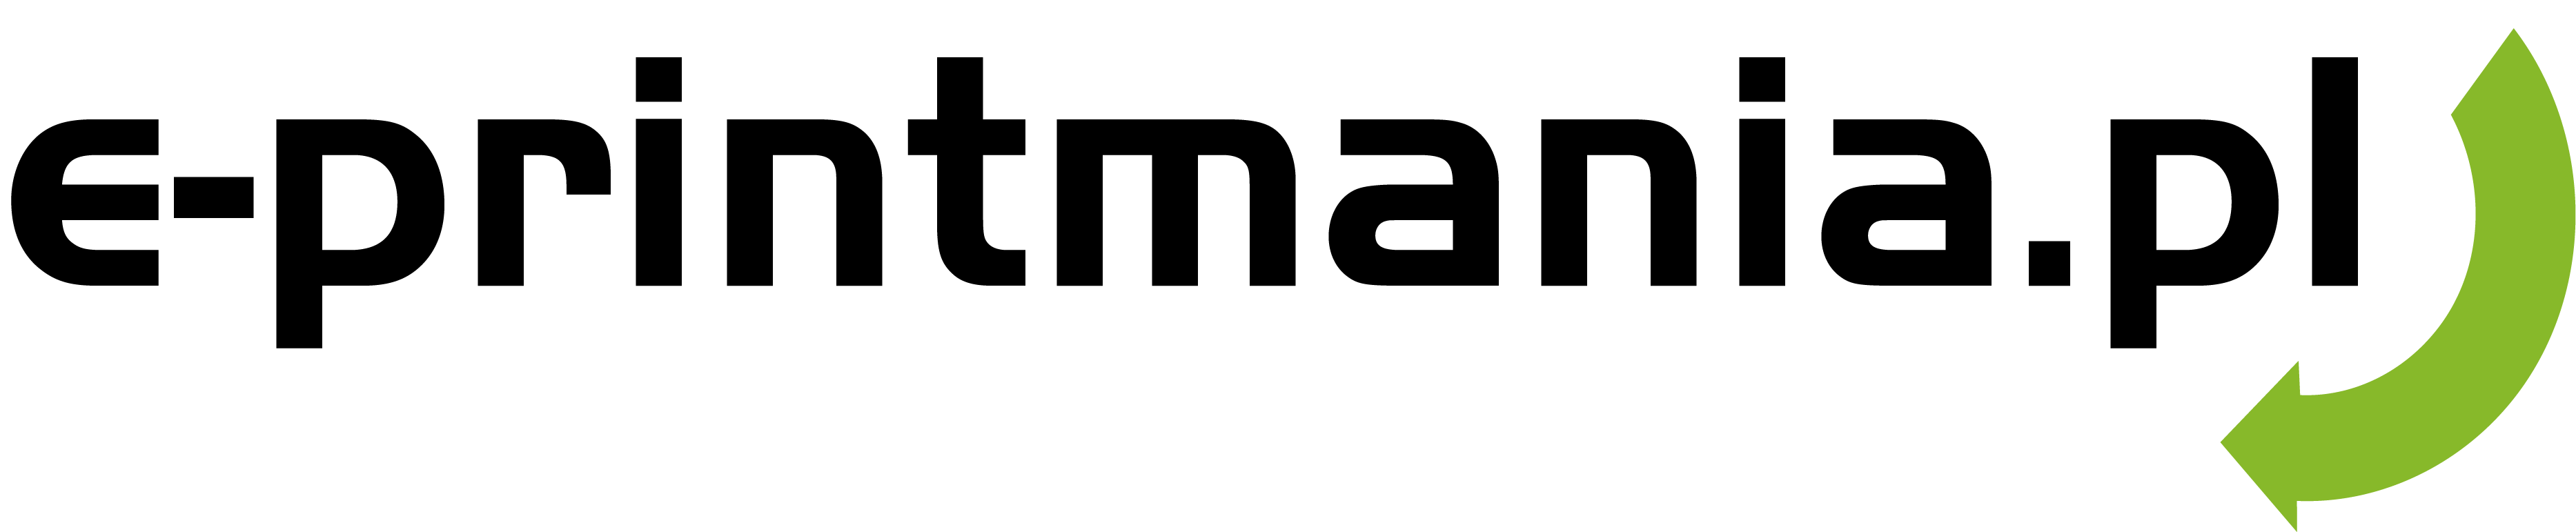 Printmania